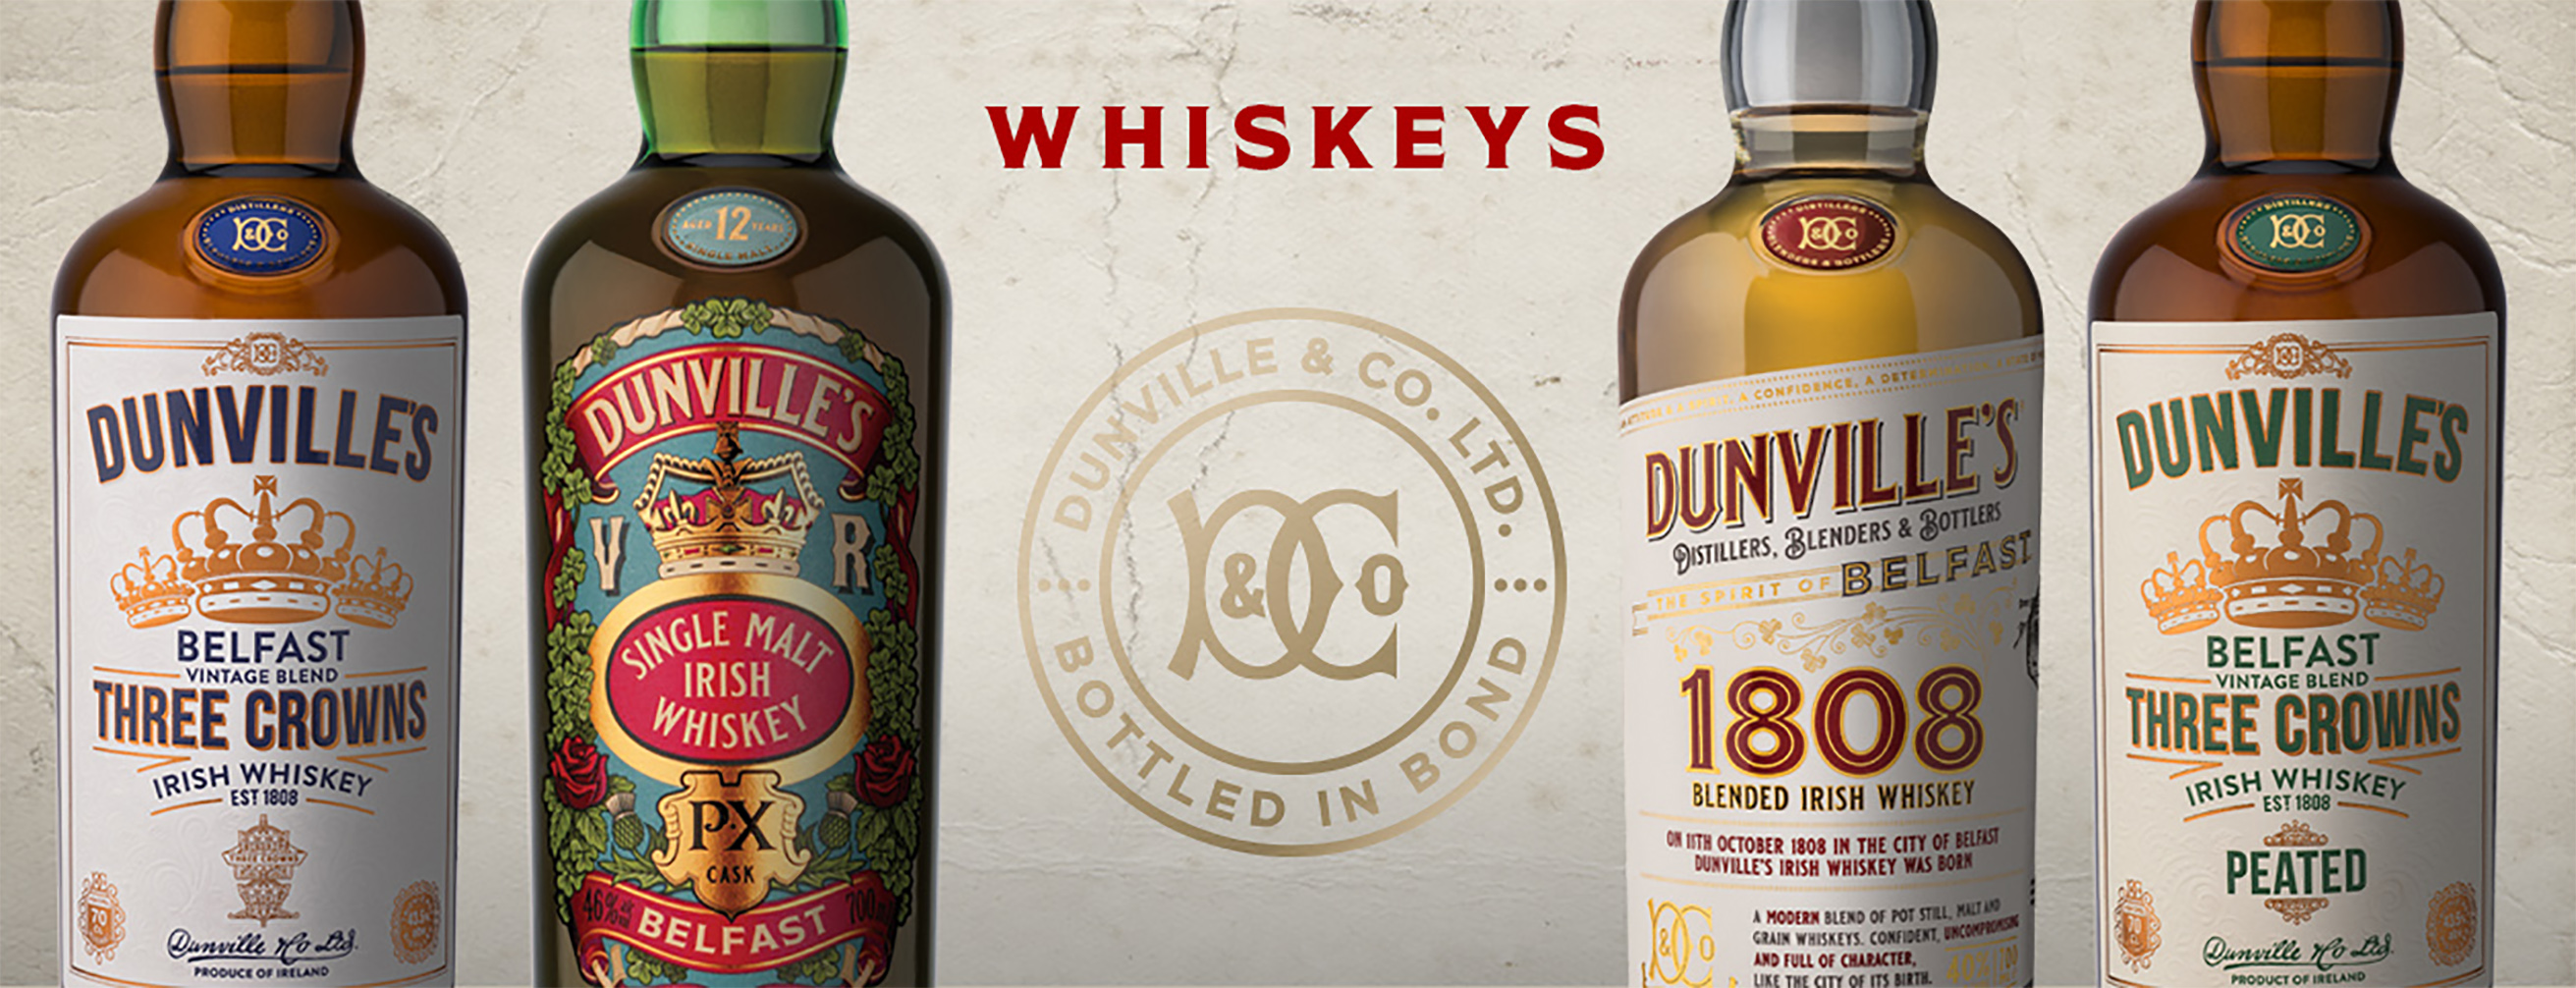 Dunville's Irish Whiskey bottle line up 2021